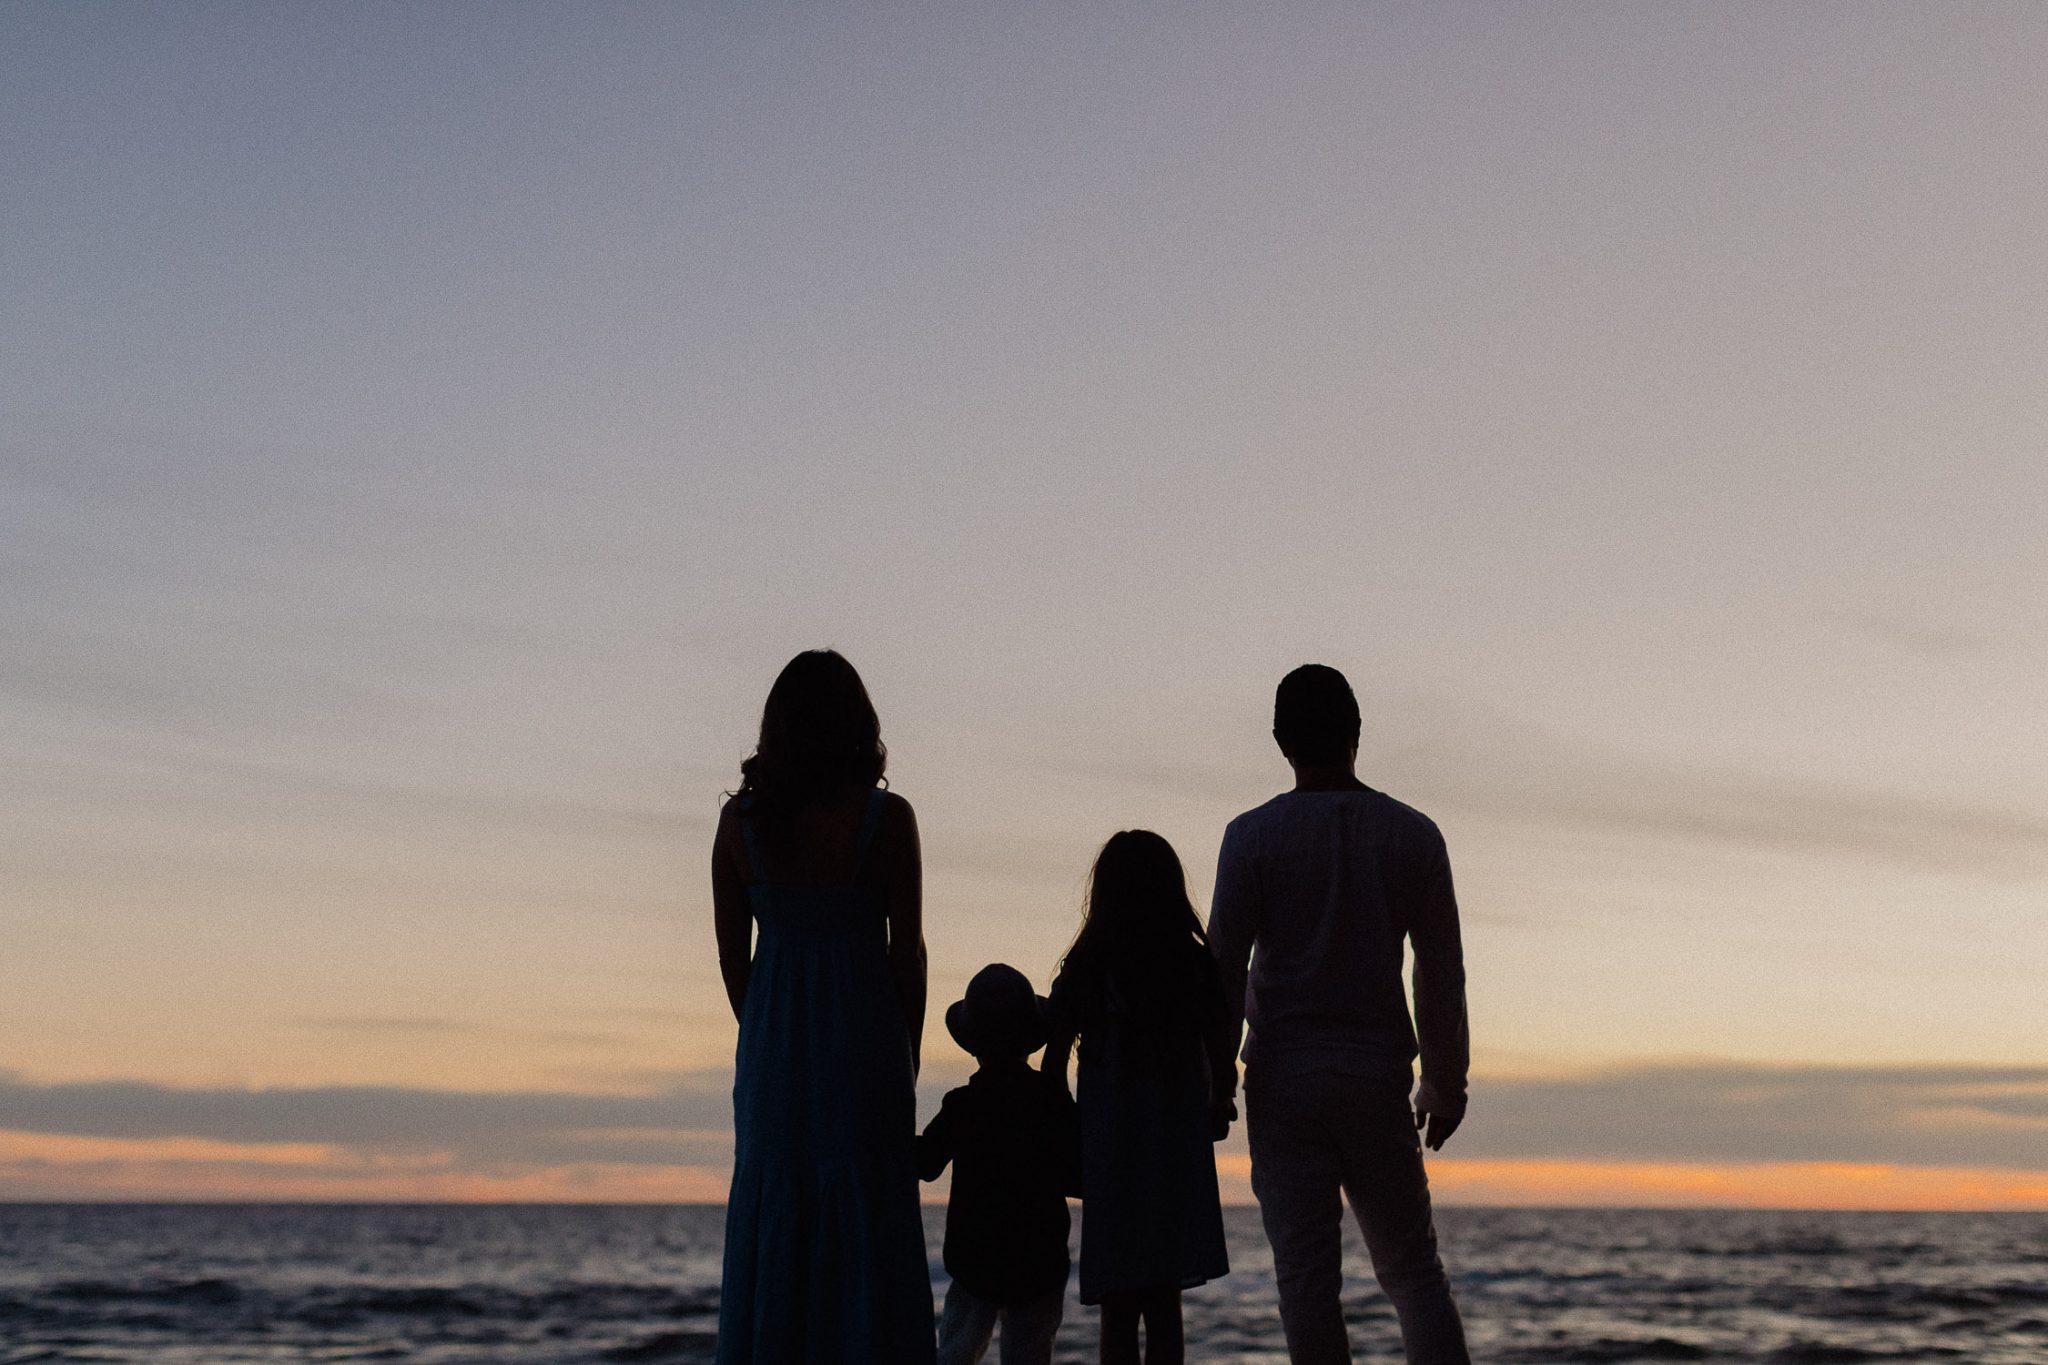 family photography, laguna beach, family, Family Pictures, family portraits, Hailley Howard, Hailley Howard family portraits, Hailley Howard Photography, Laguna Beach family pictures, beach family portraits